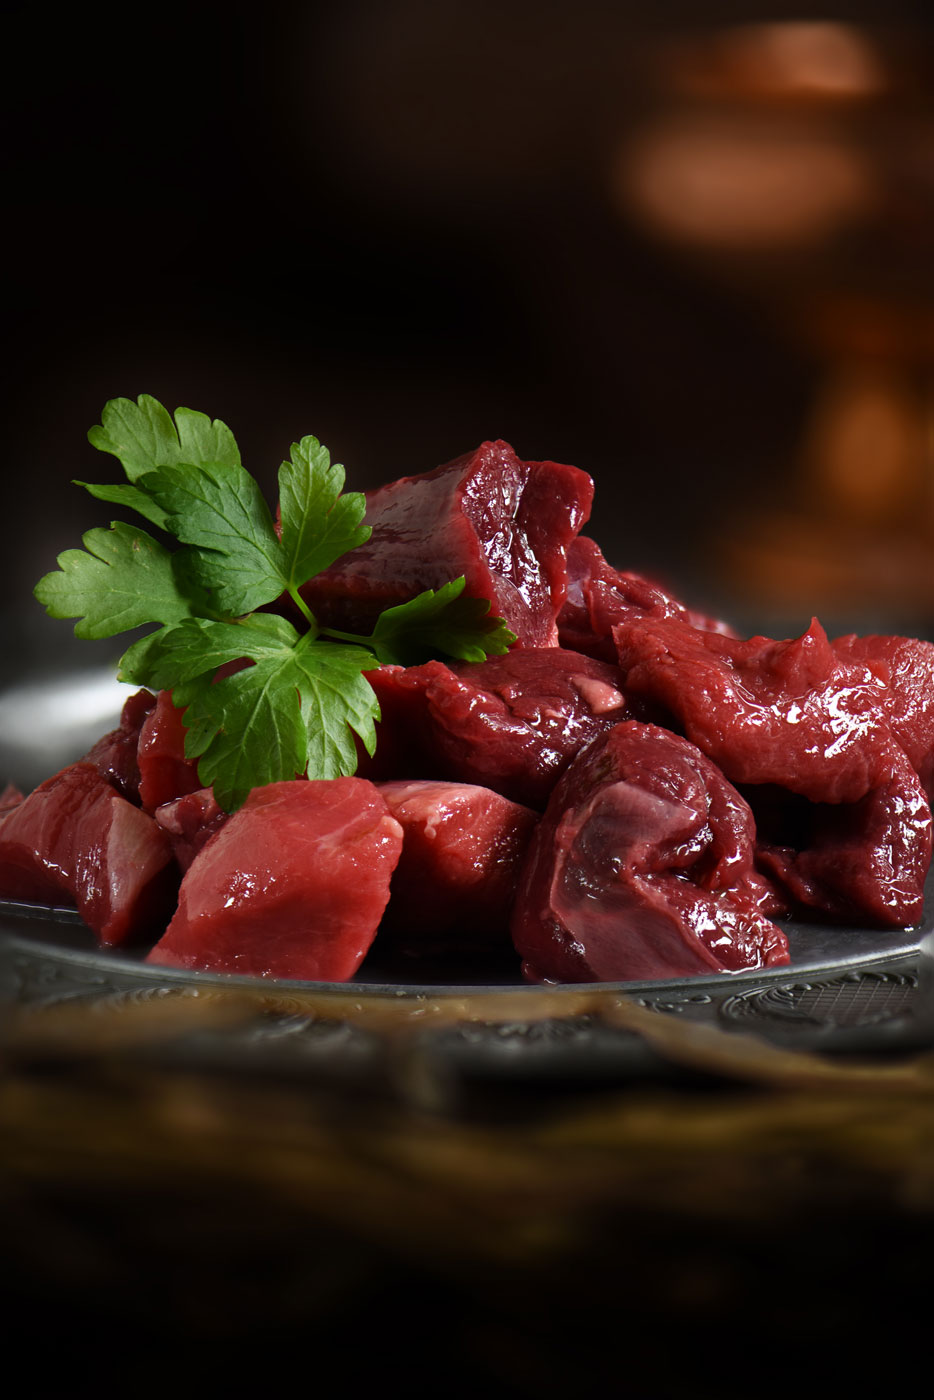 Herten poulet, Wild vlees van Veluws hert